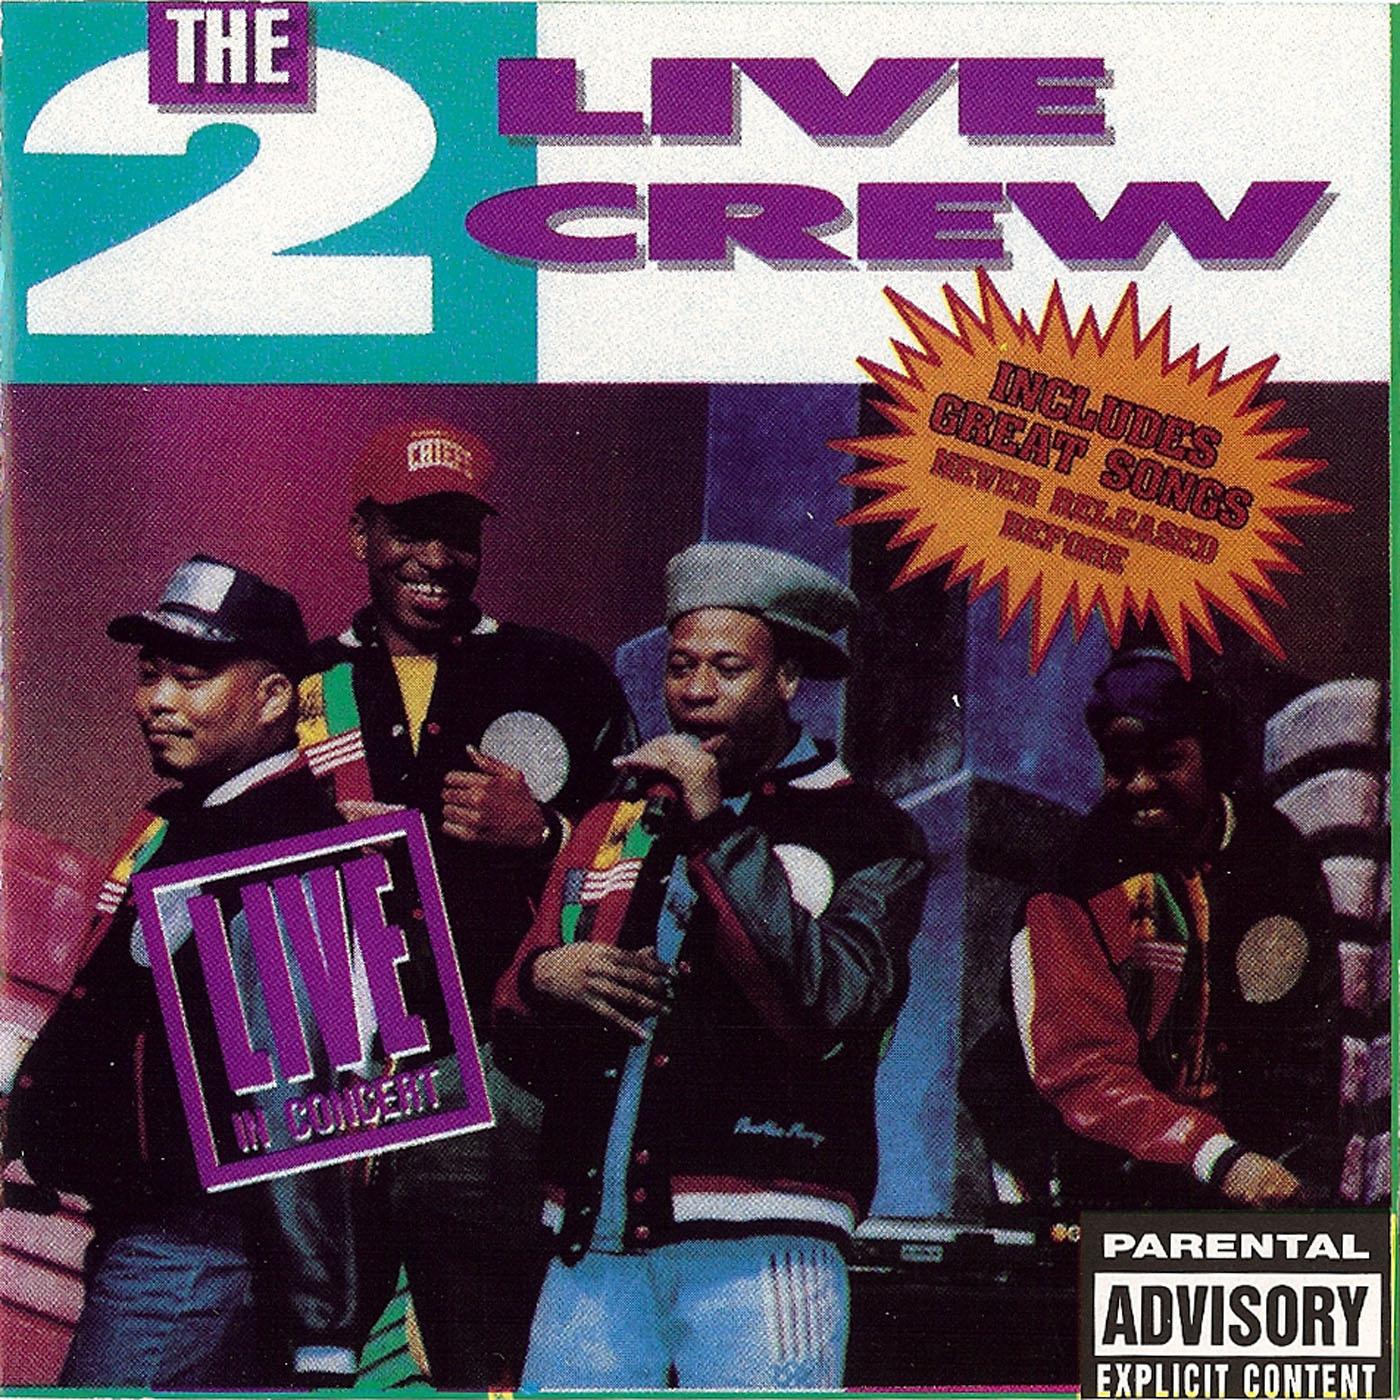 Live In ConcertnÇóexplicitnÇóThe 2 Live Crew